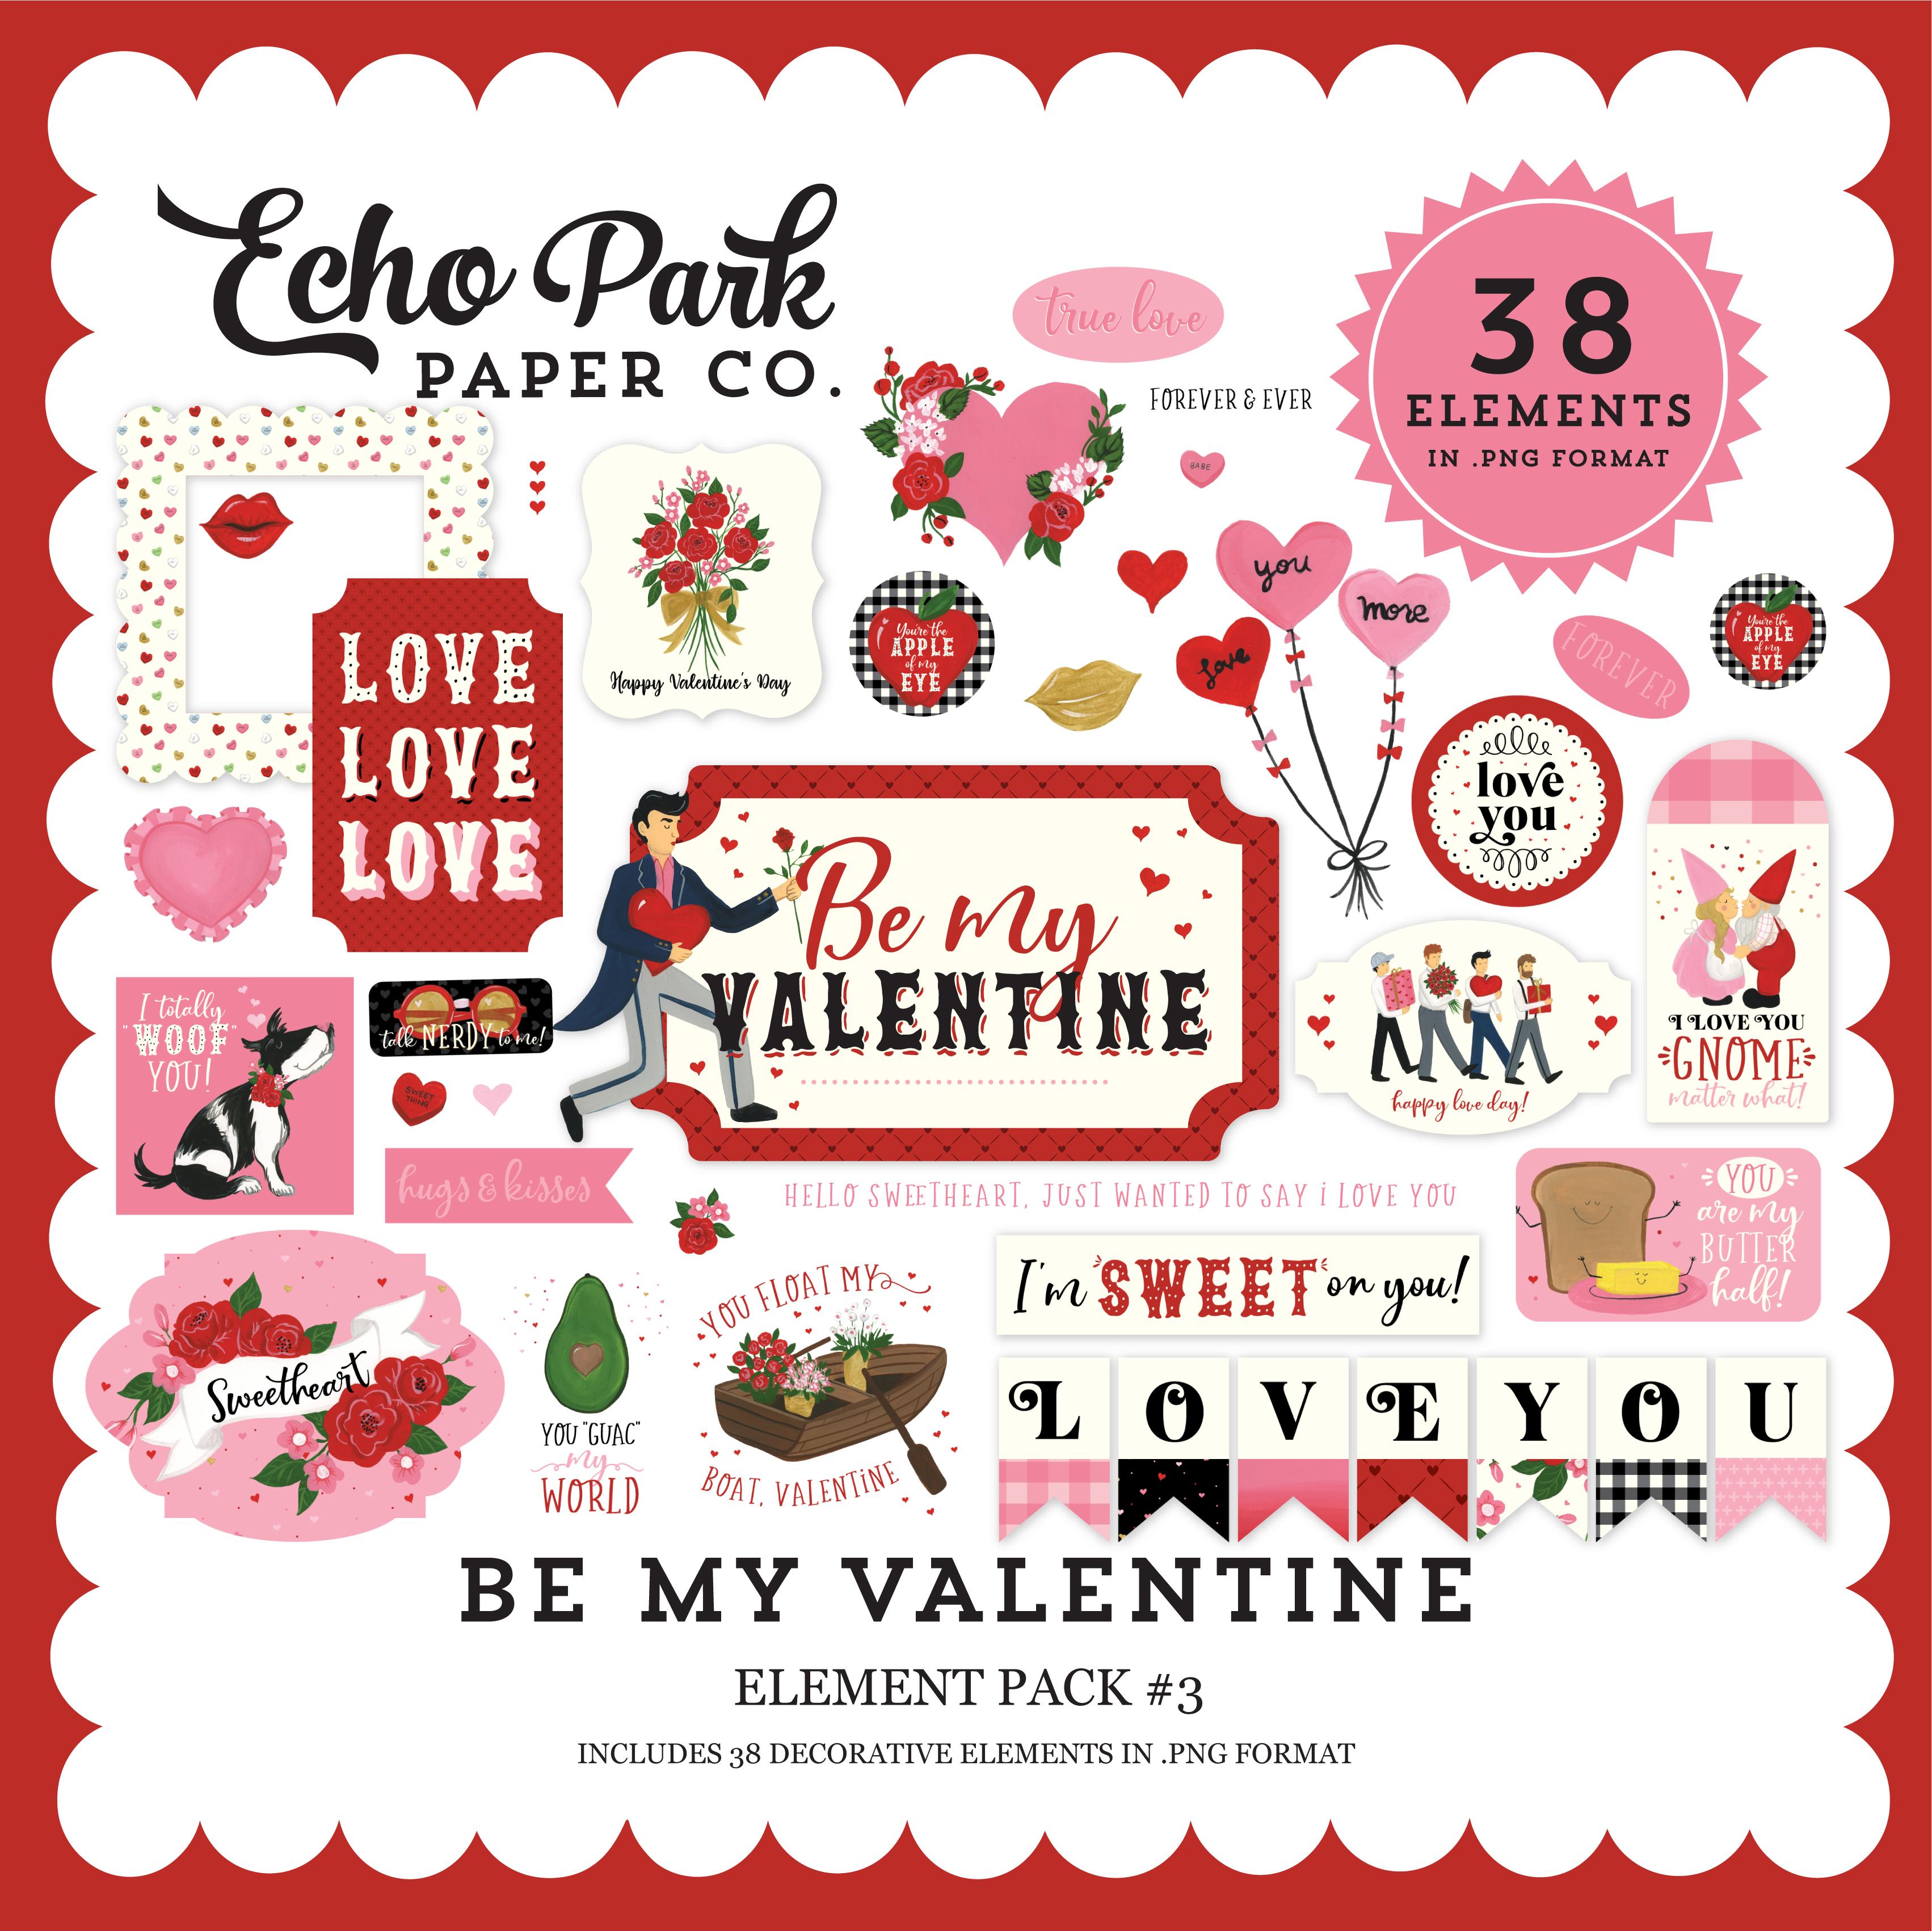 Be My Valentine Element Pack #3